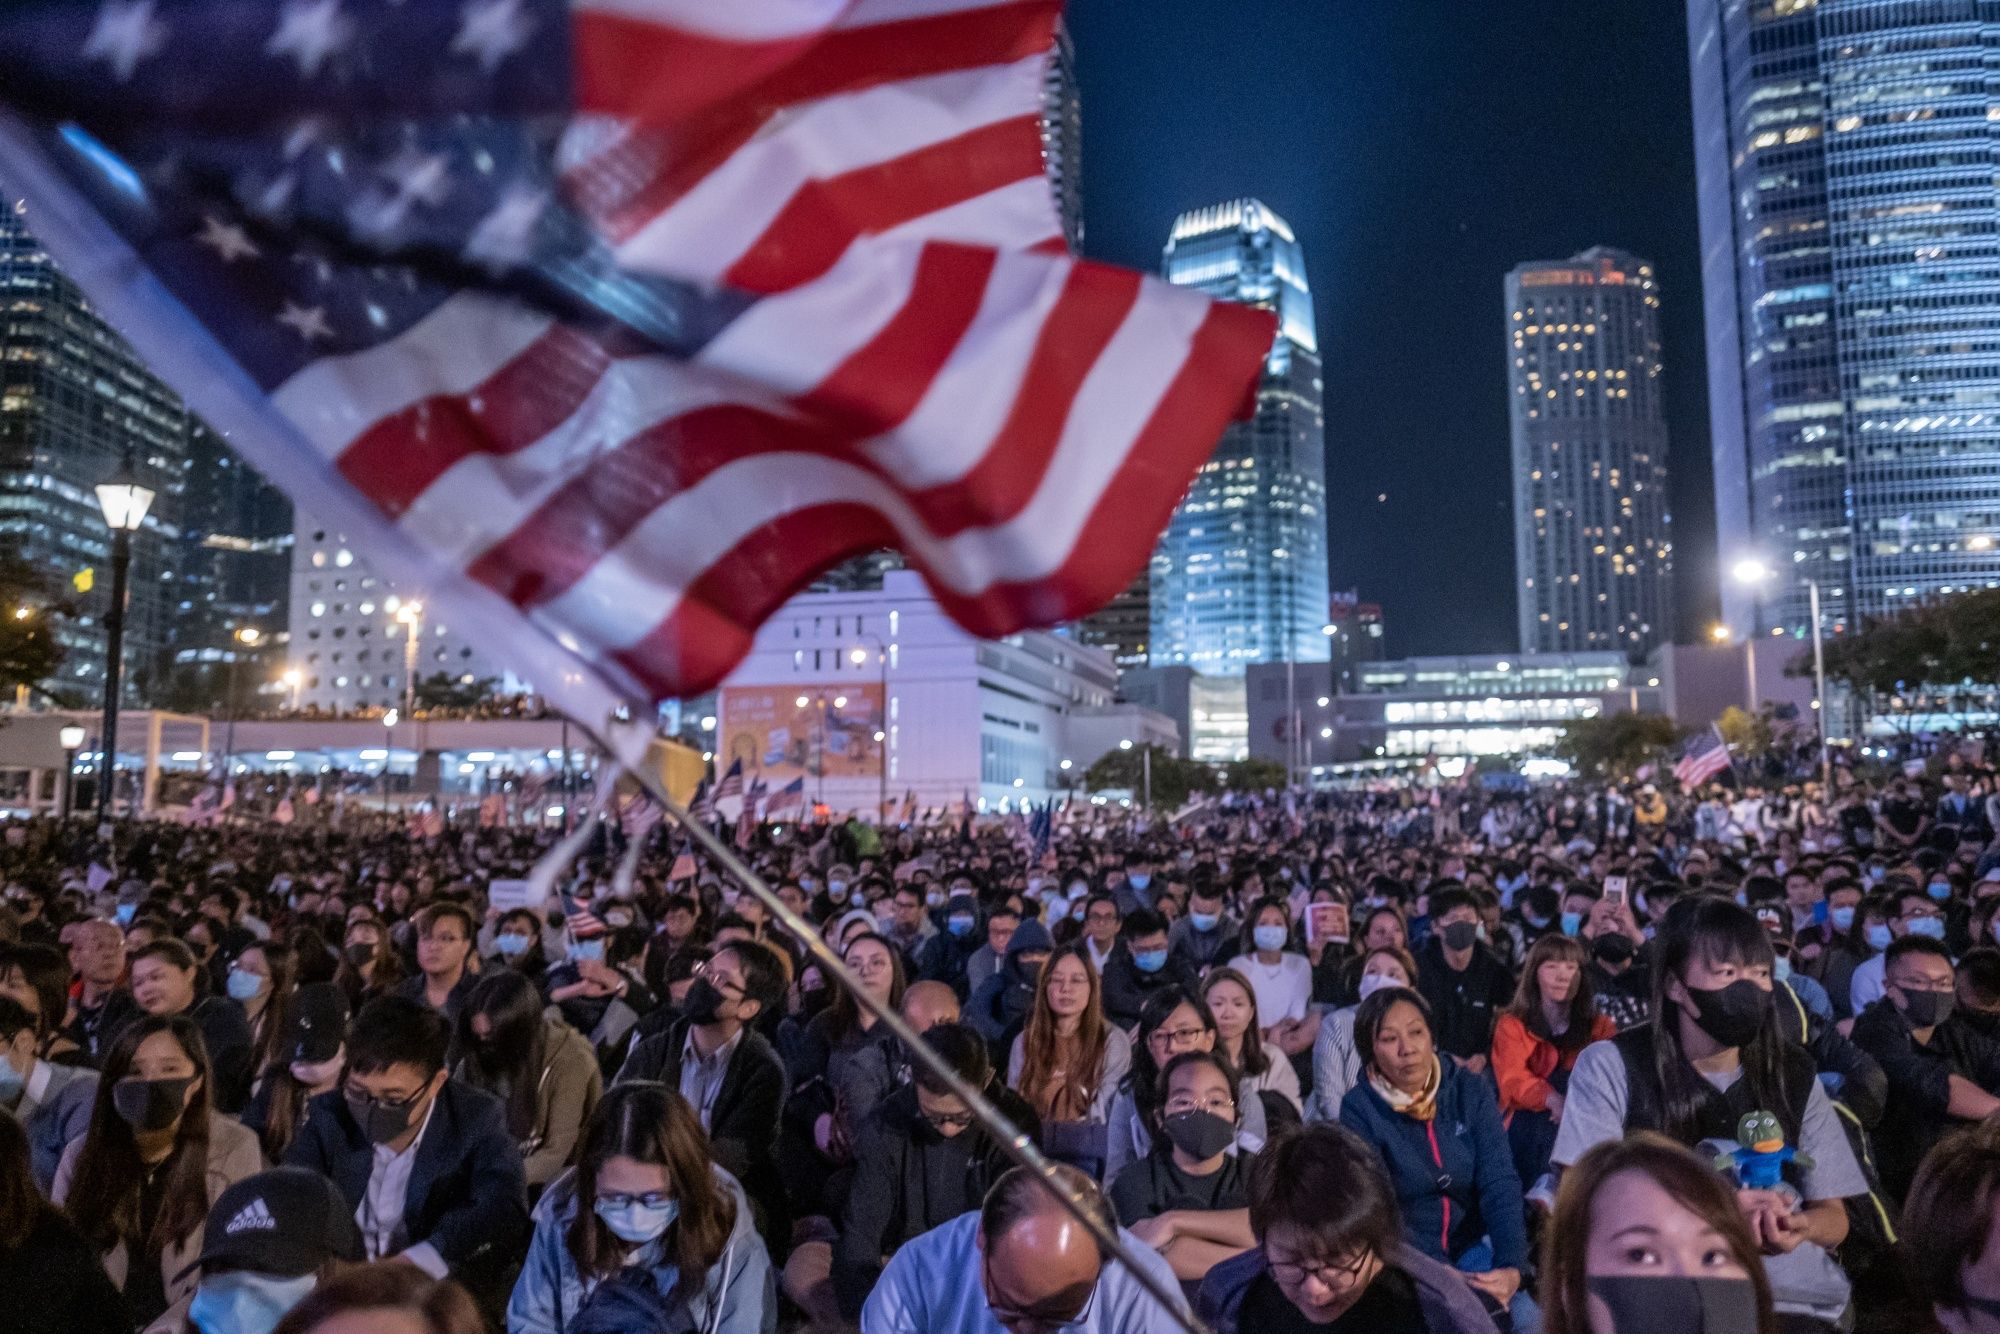 Democrats Aim Strong Words Against China Over Hong Kong, Uighurs